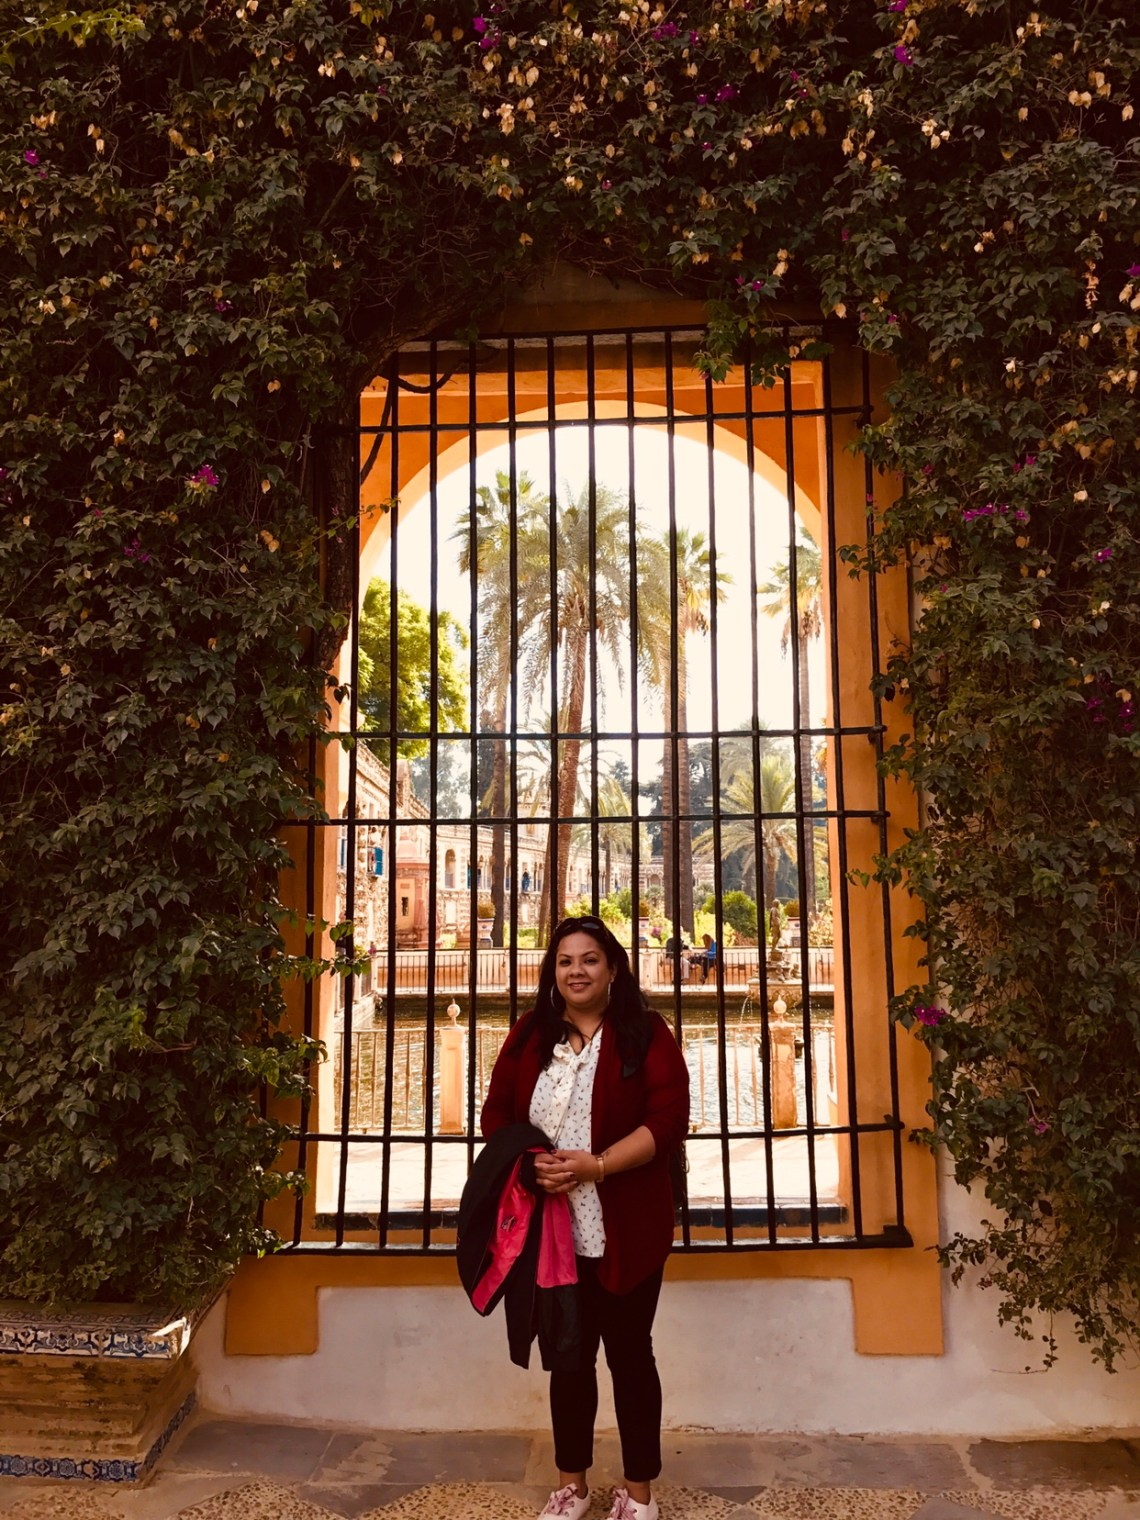 Seville_2_26